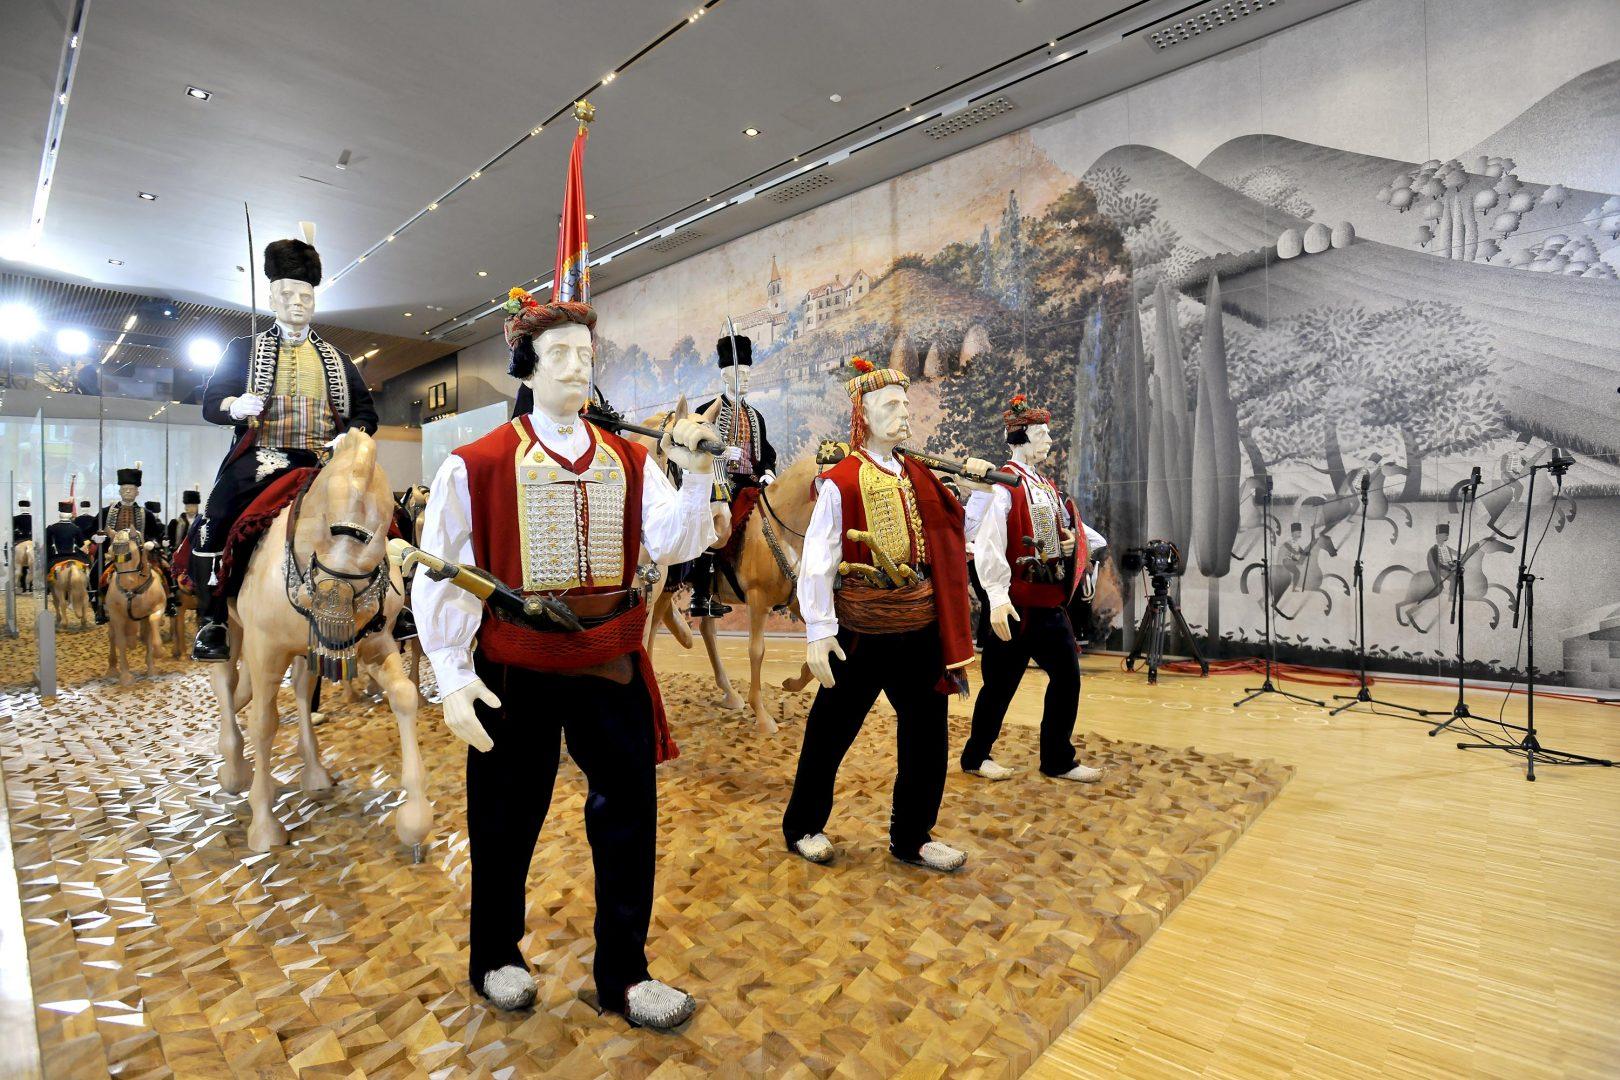 Besplatno razgledavanje Muzeja Sinjske alke